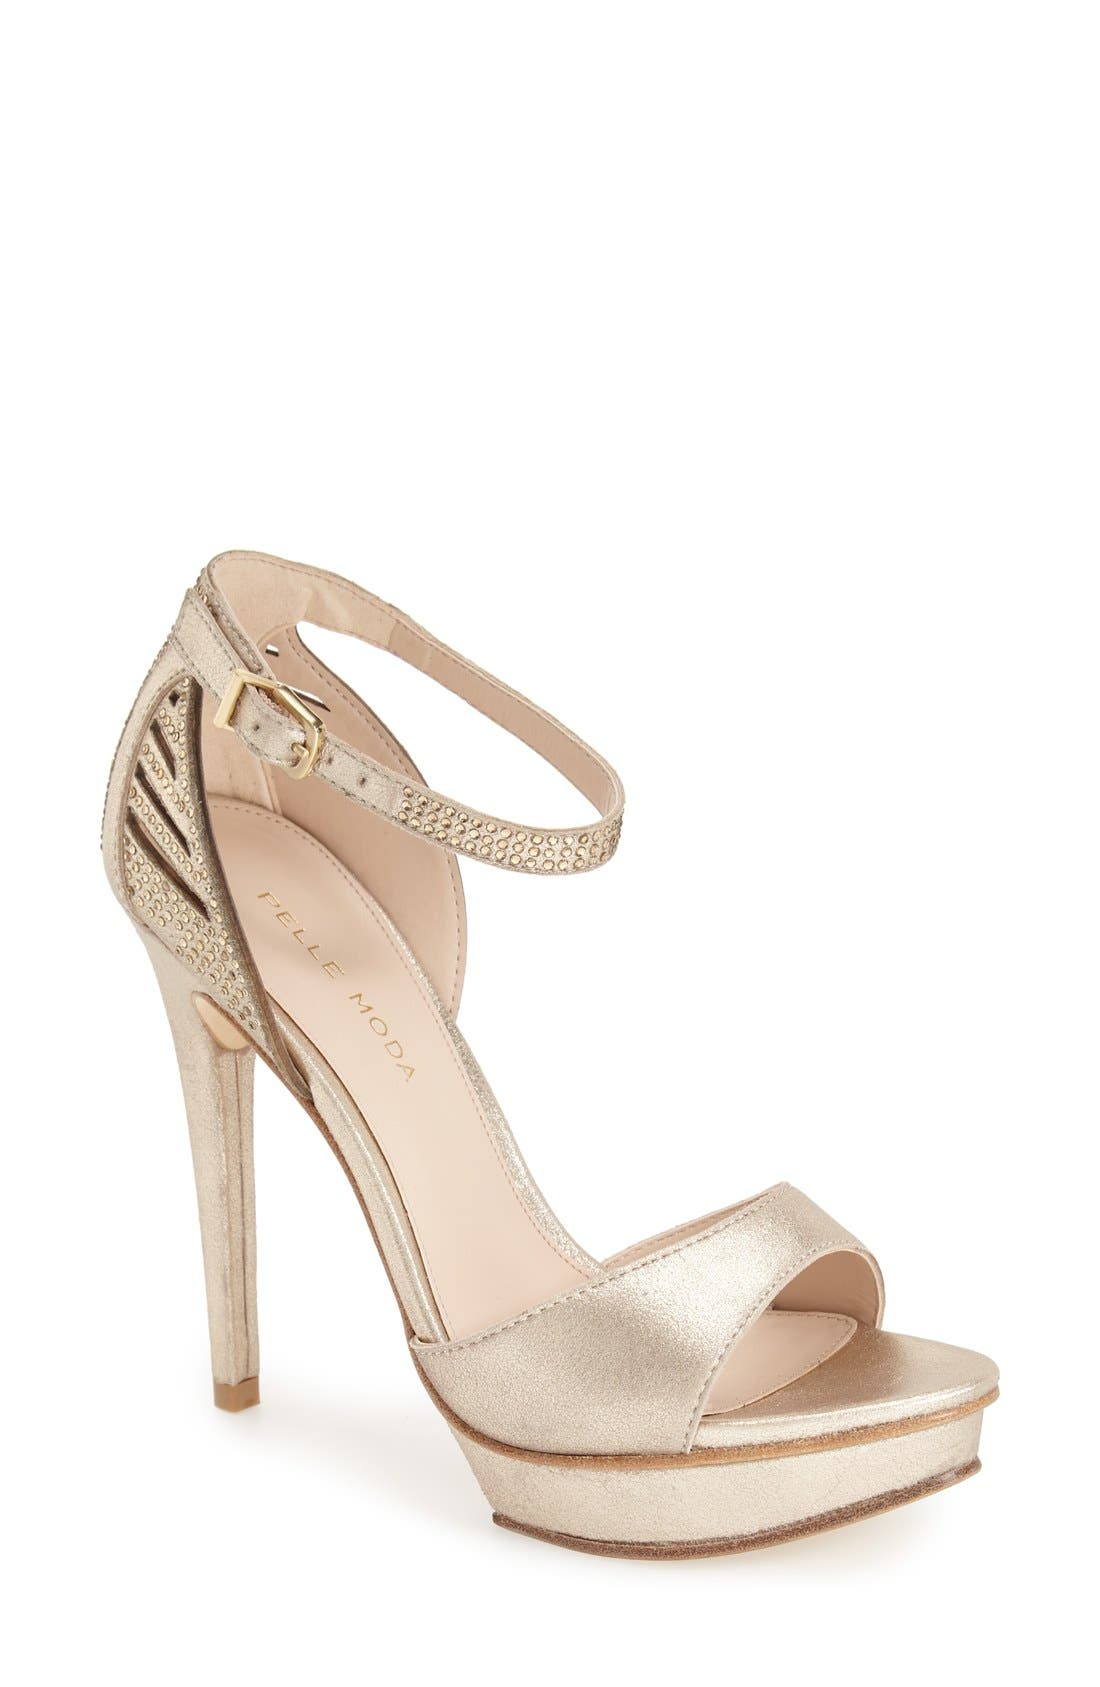 'Fenton' Ankle Strap Sandal,                             Main thumbnail 7, color,